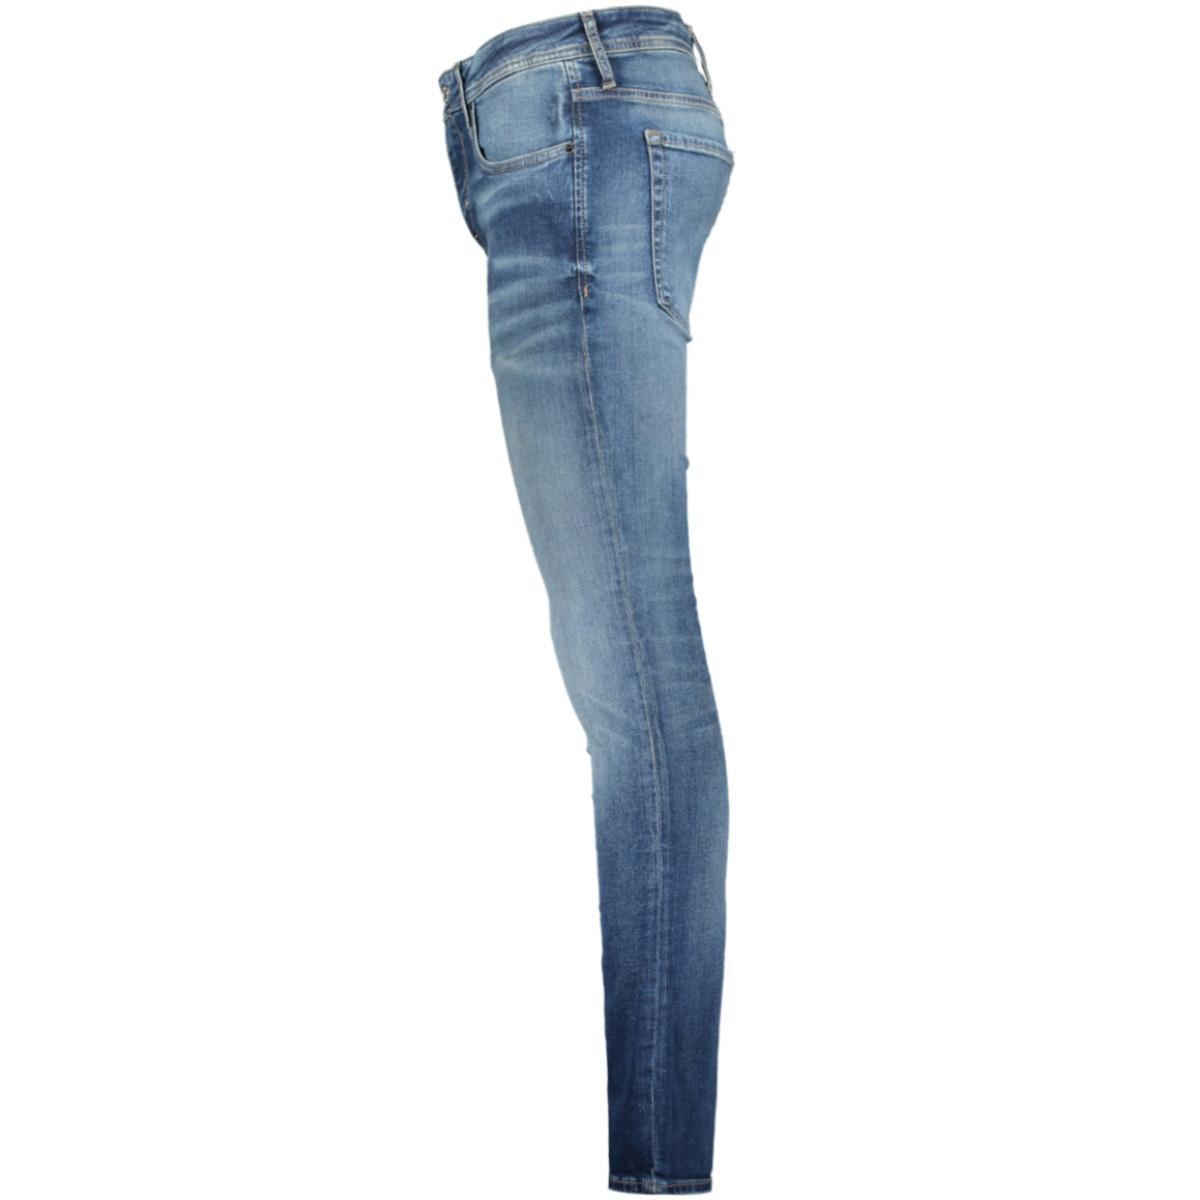 jeans tapered ozzy mmdt00198 antony morato jeans 7010 blue denim